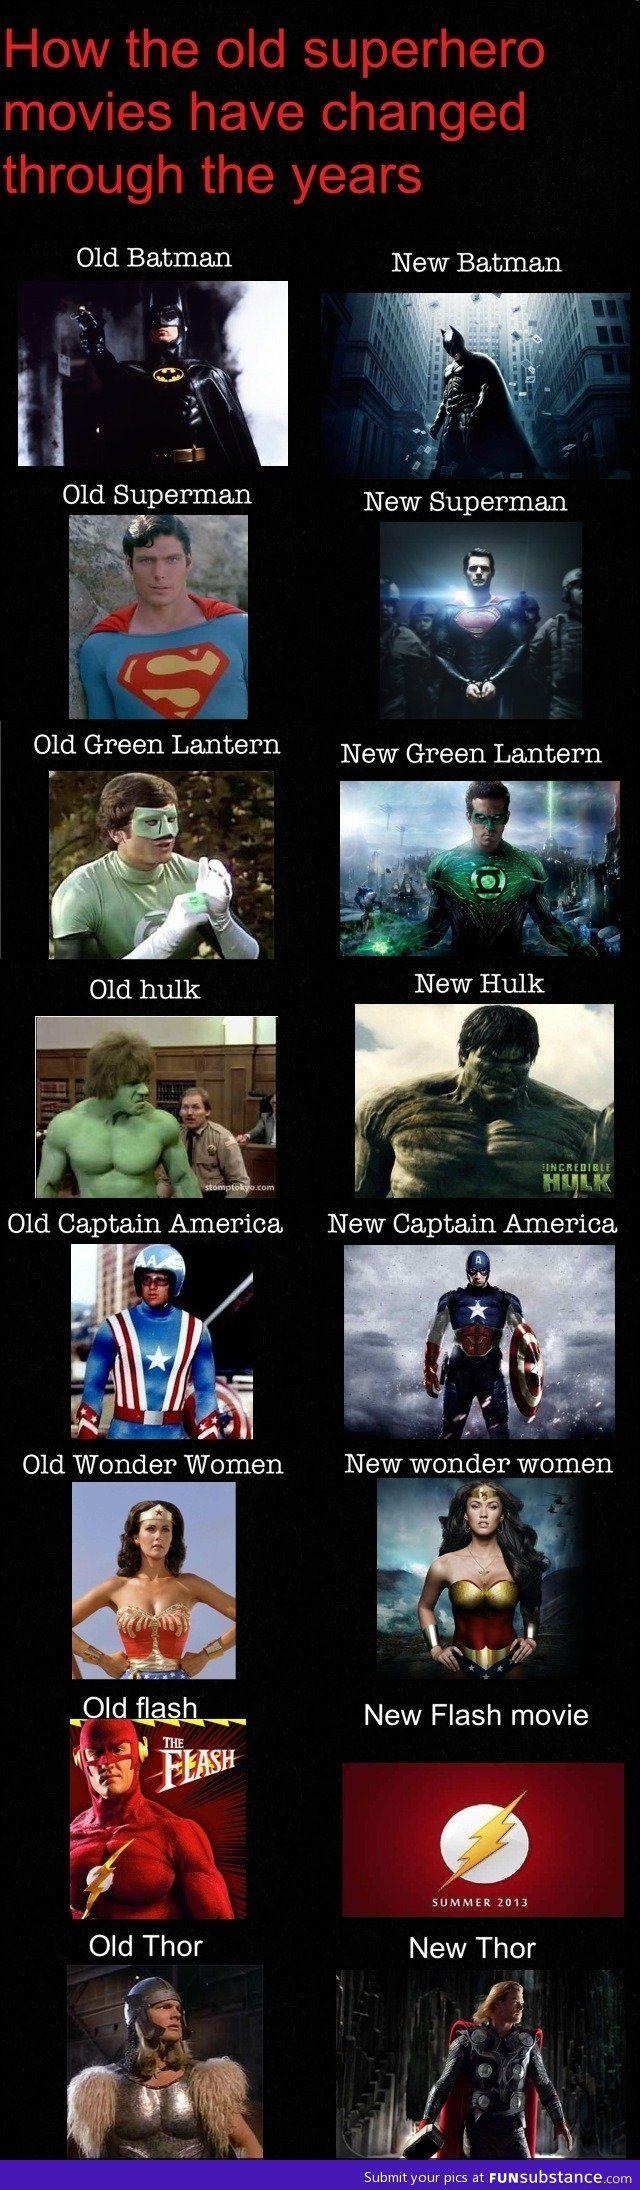 Evolution of superhero movies...